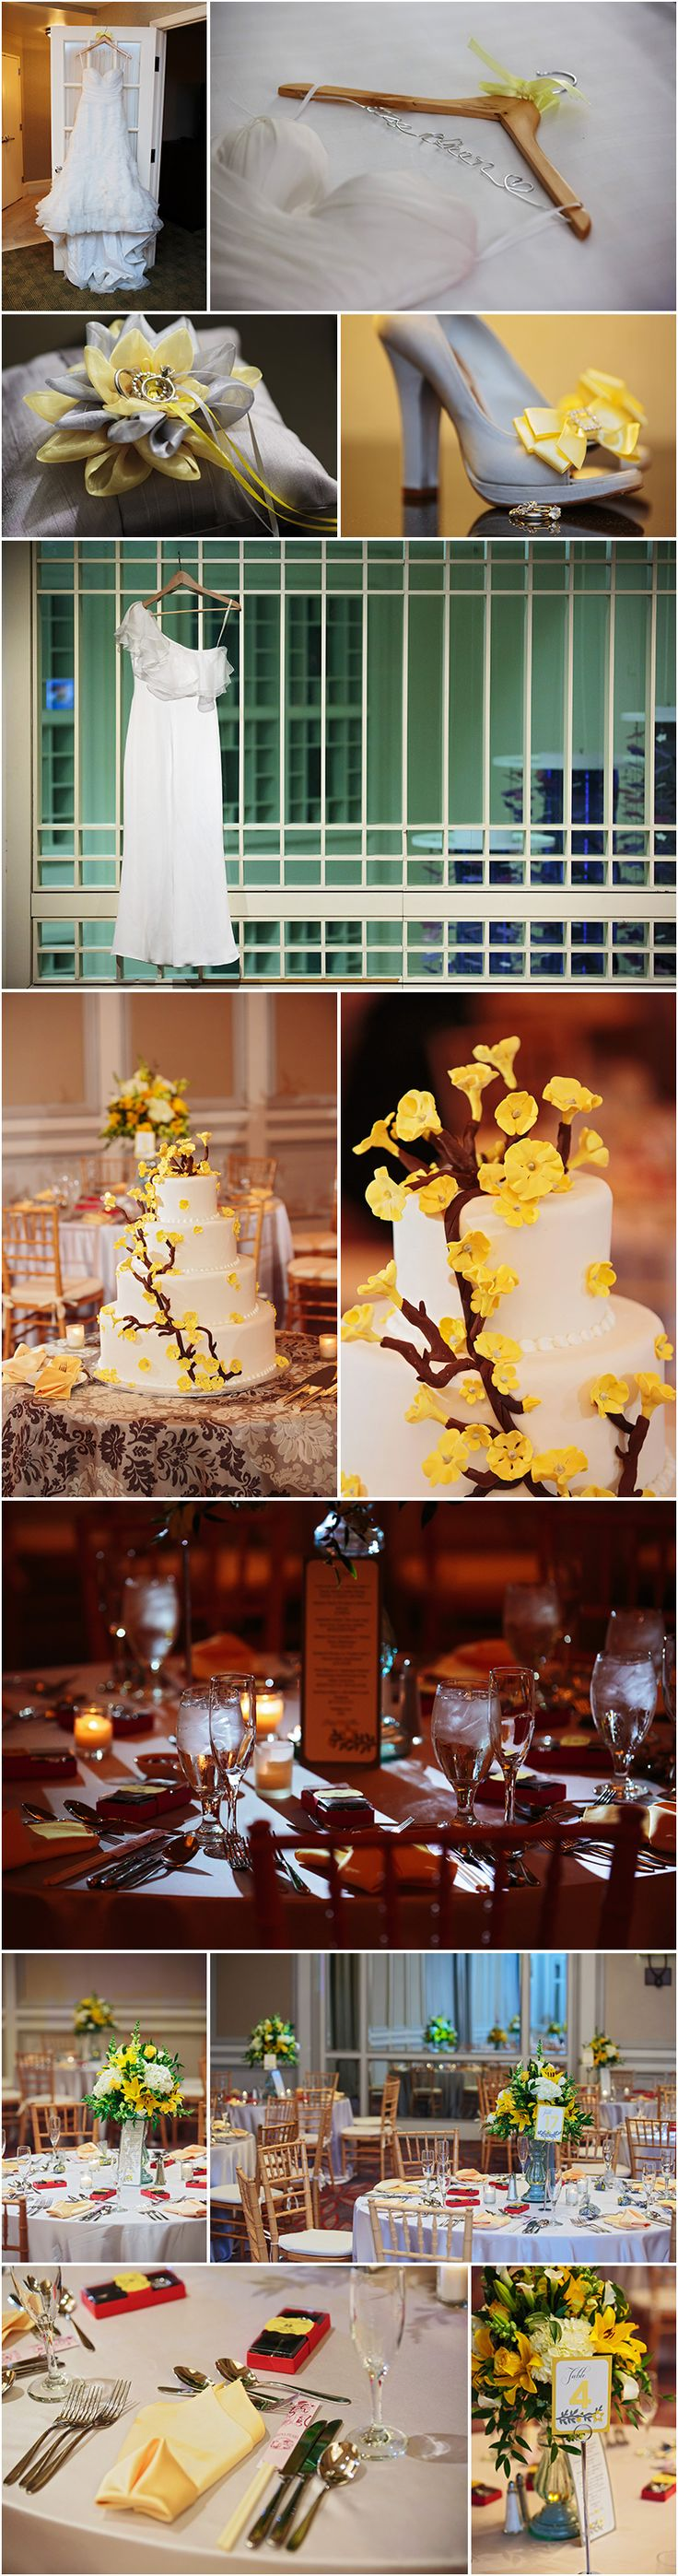 WEDDING PHOTOS HYATT REGENCY BOSTON